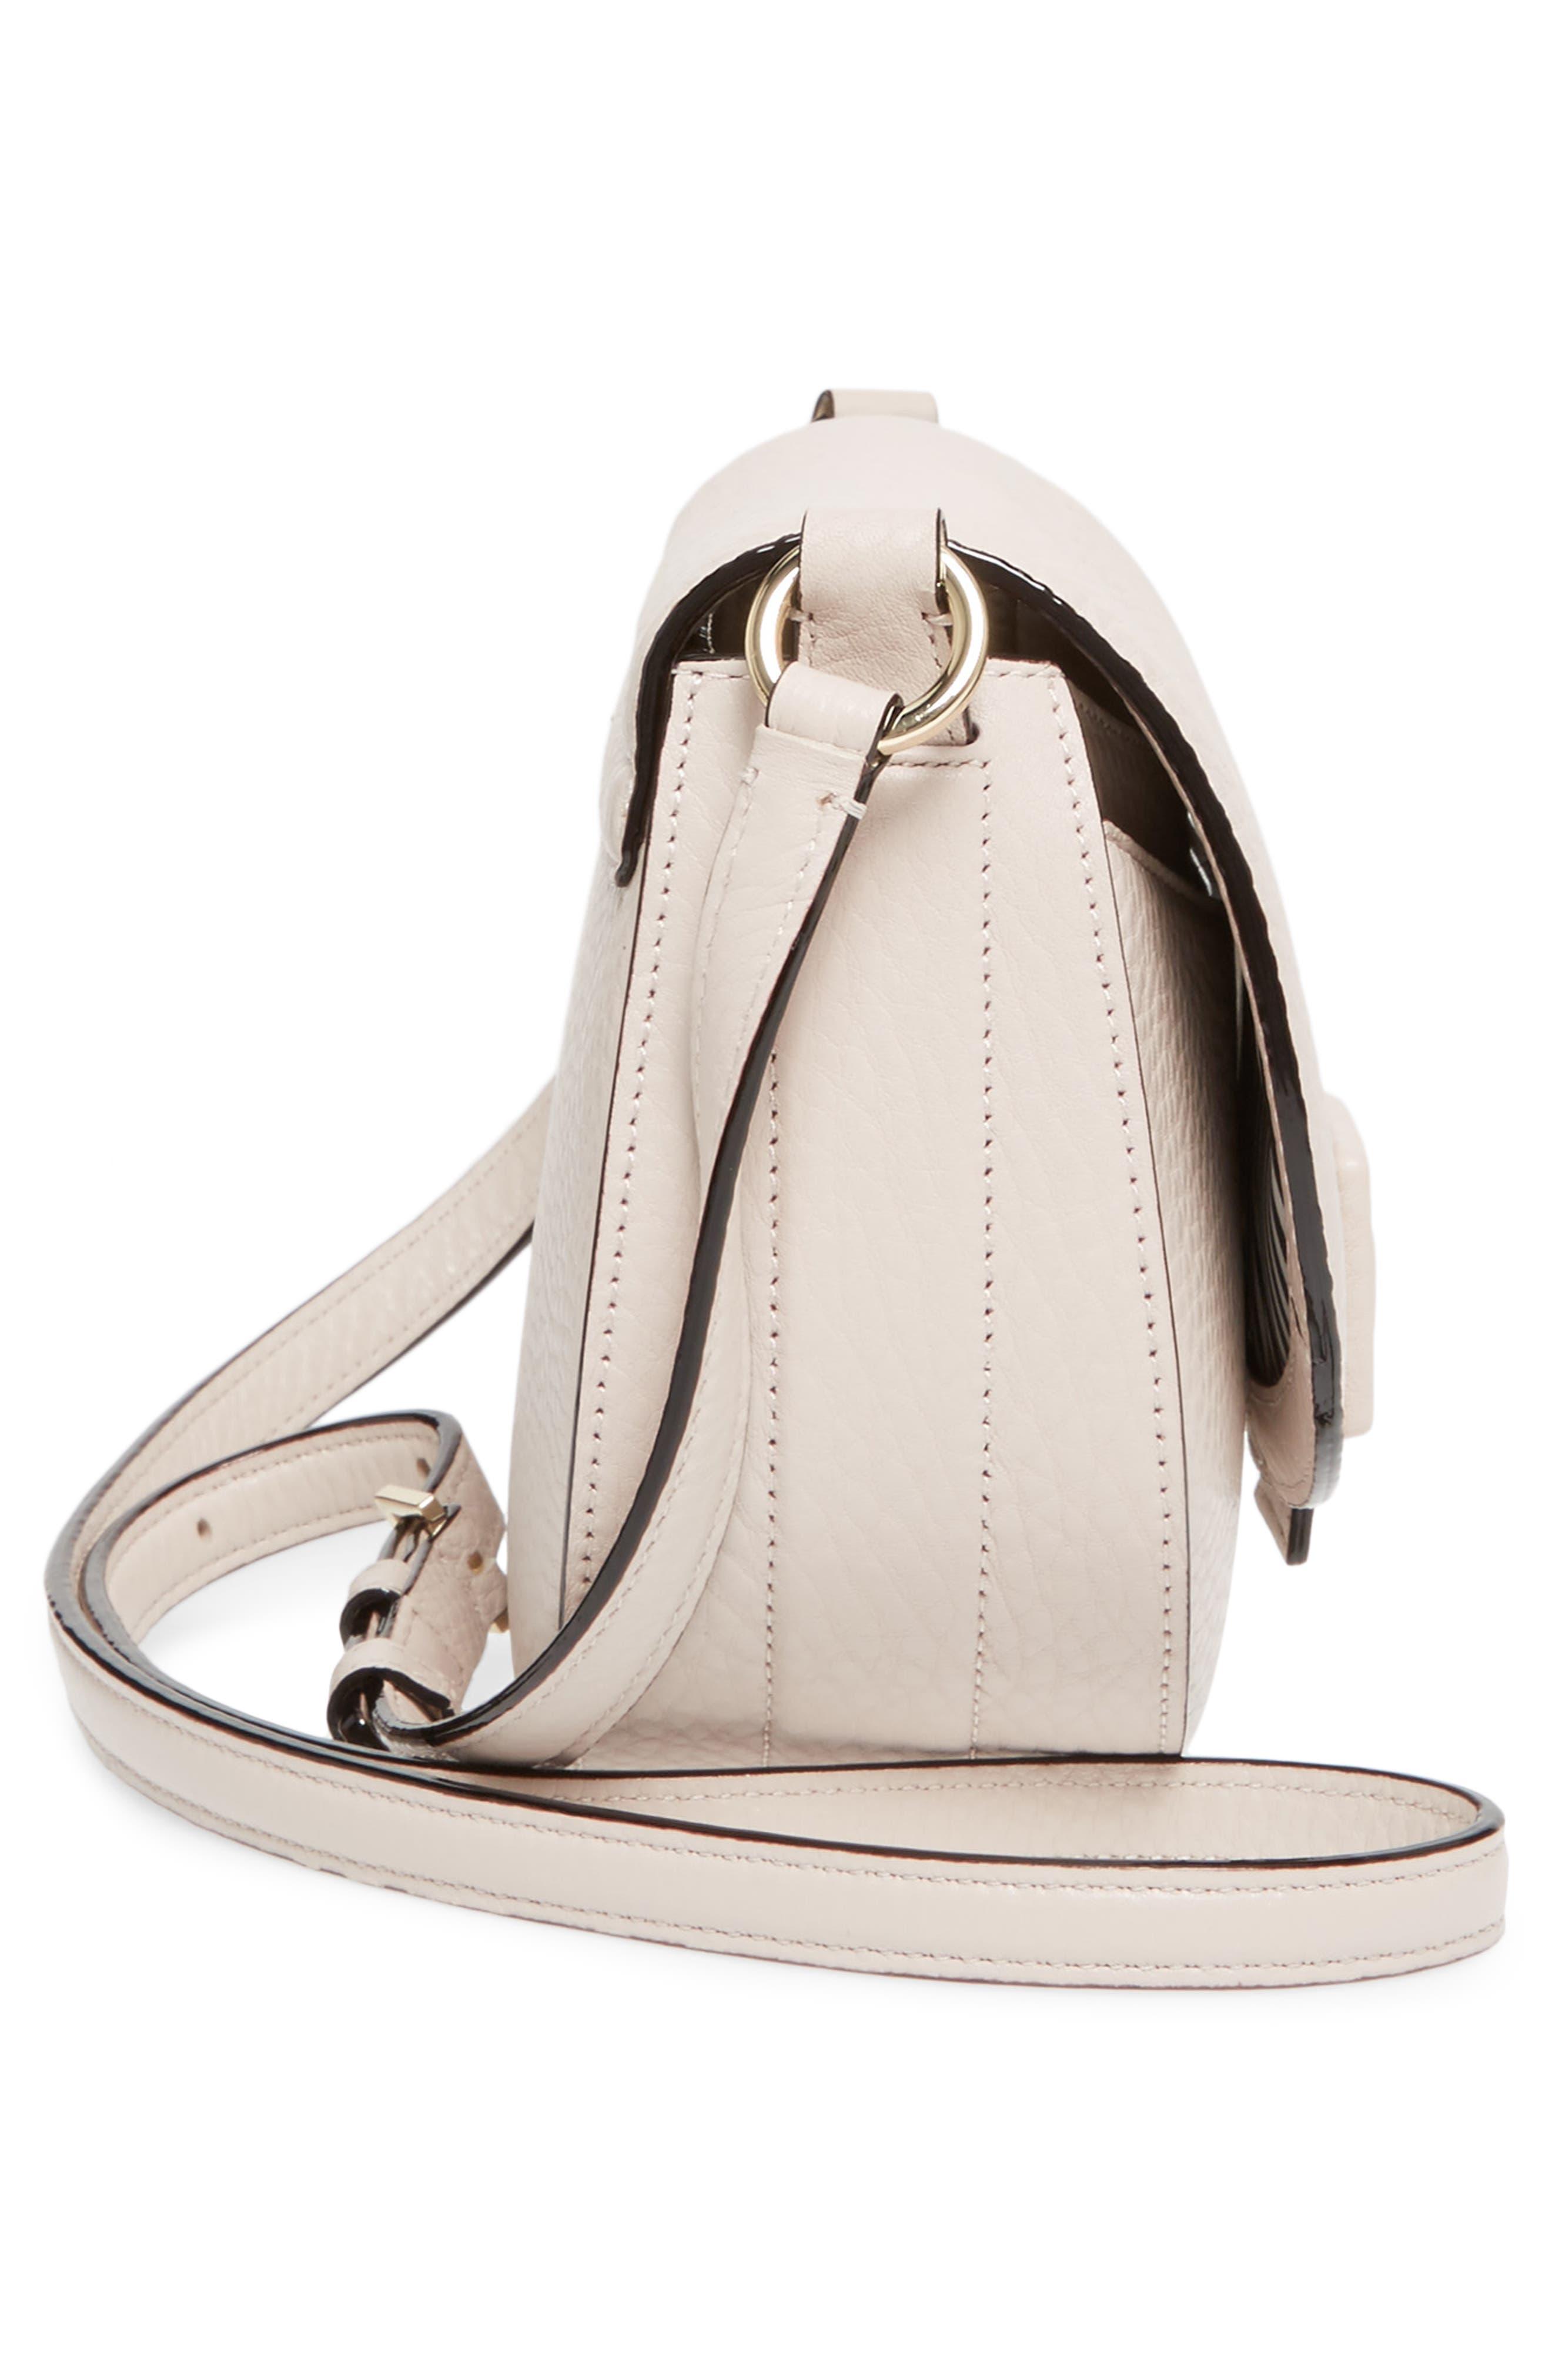 carlyle street - kallie leather saddle bag,                             Alternate thumbnail 14, color,